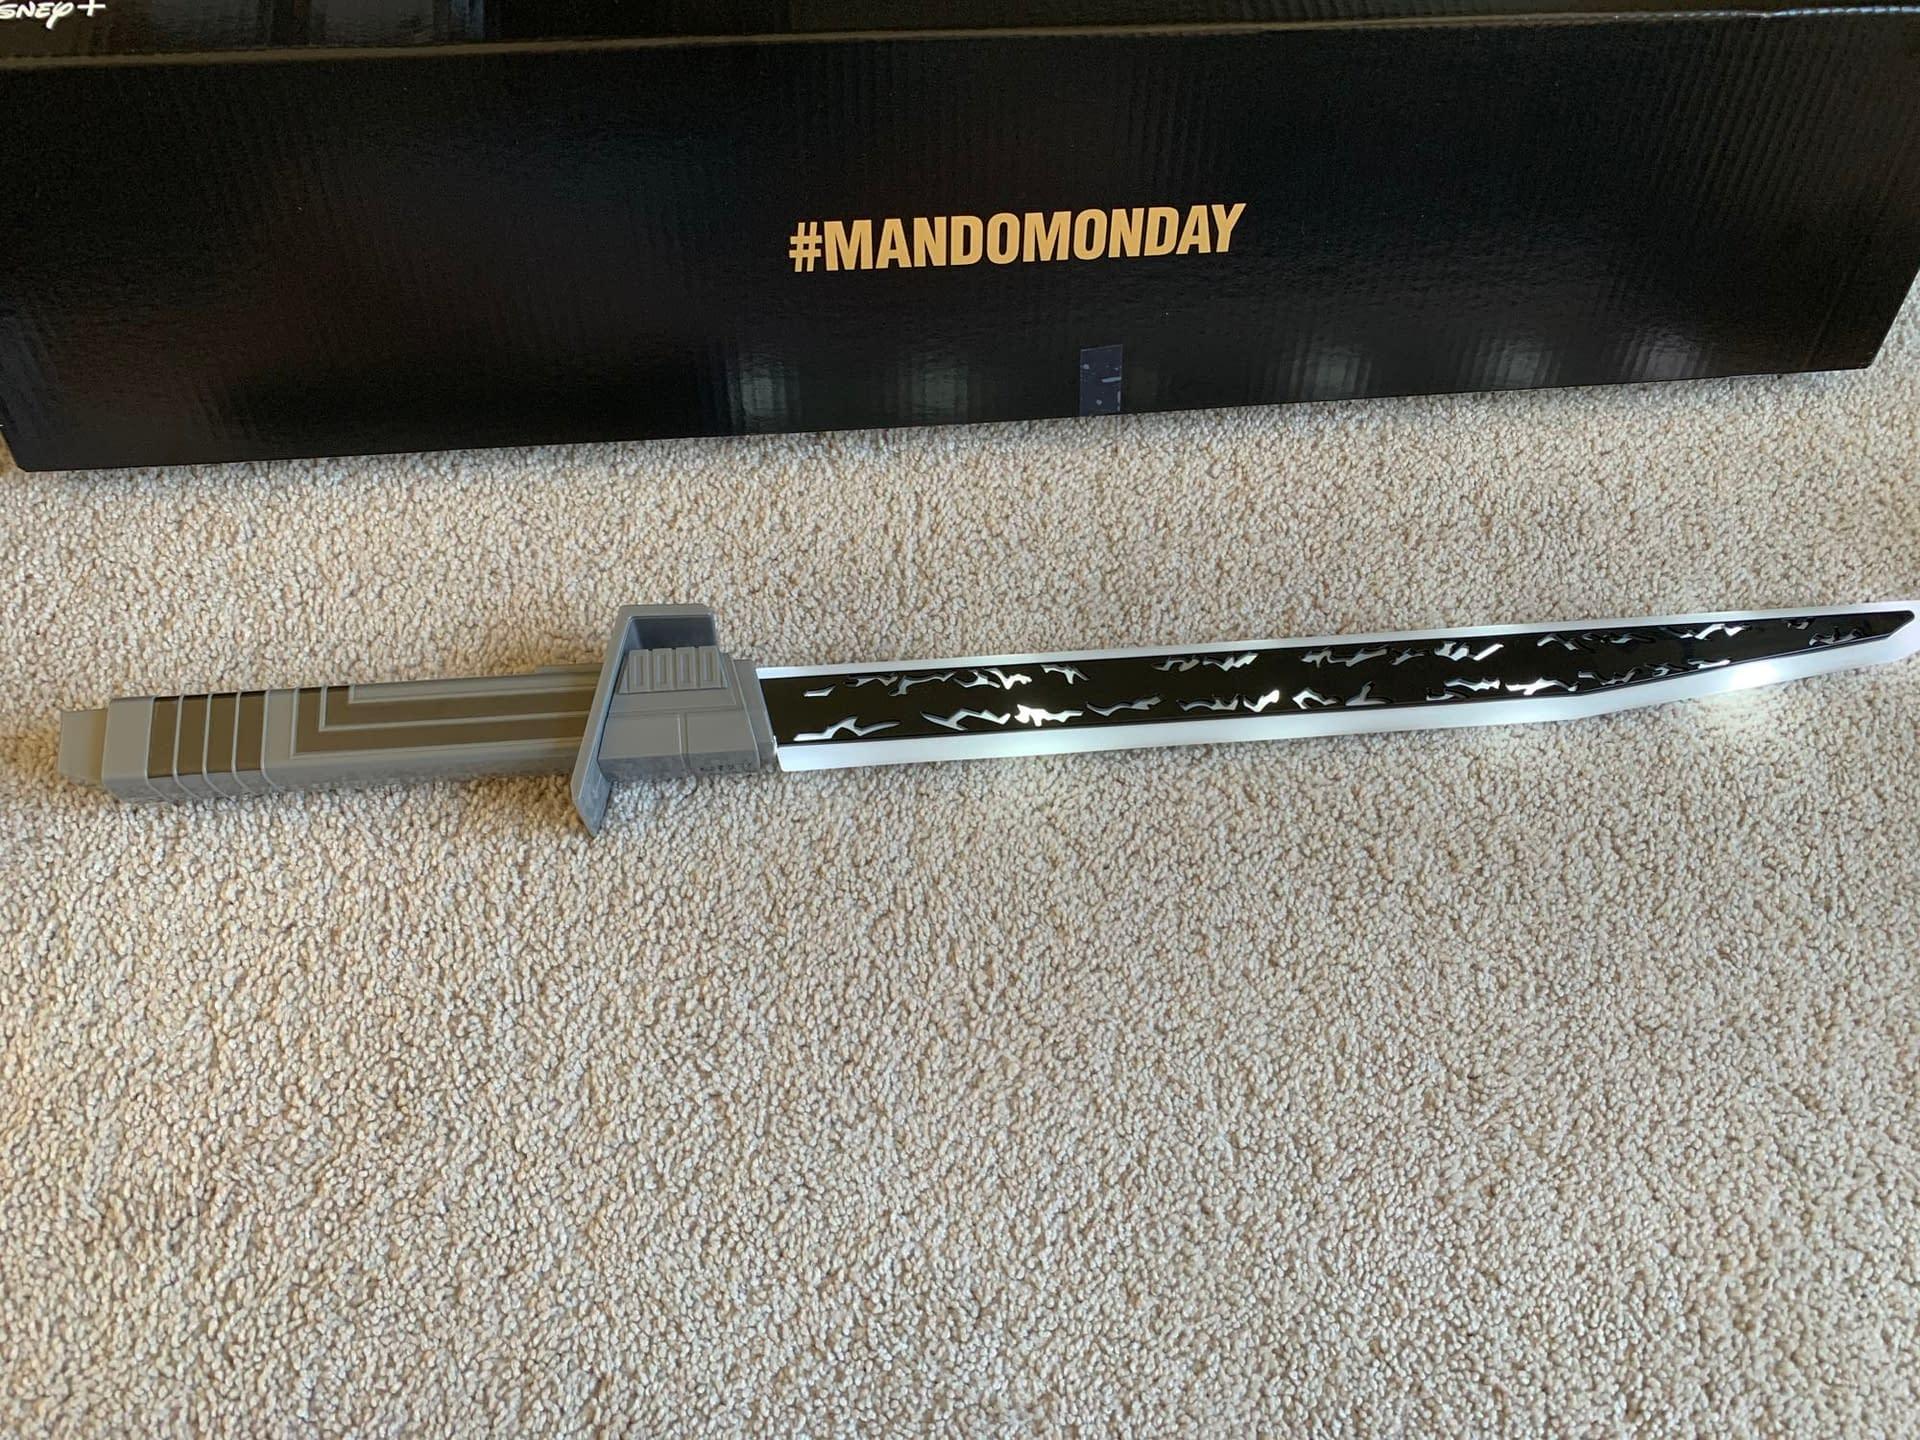 Hasbro Sent Us A Big Box Of Mandalorian Toys, Let's Check Em Out